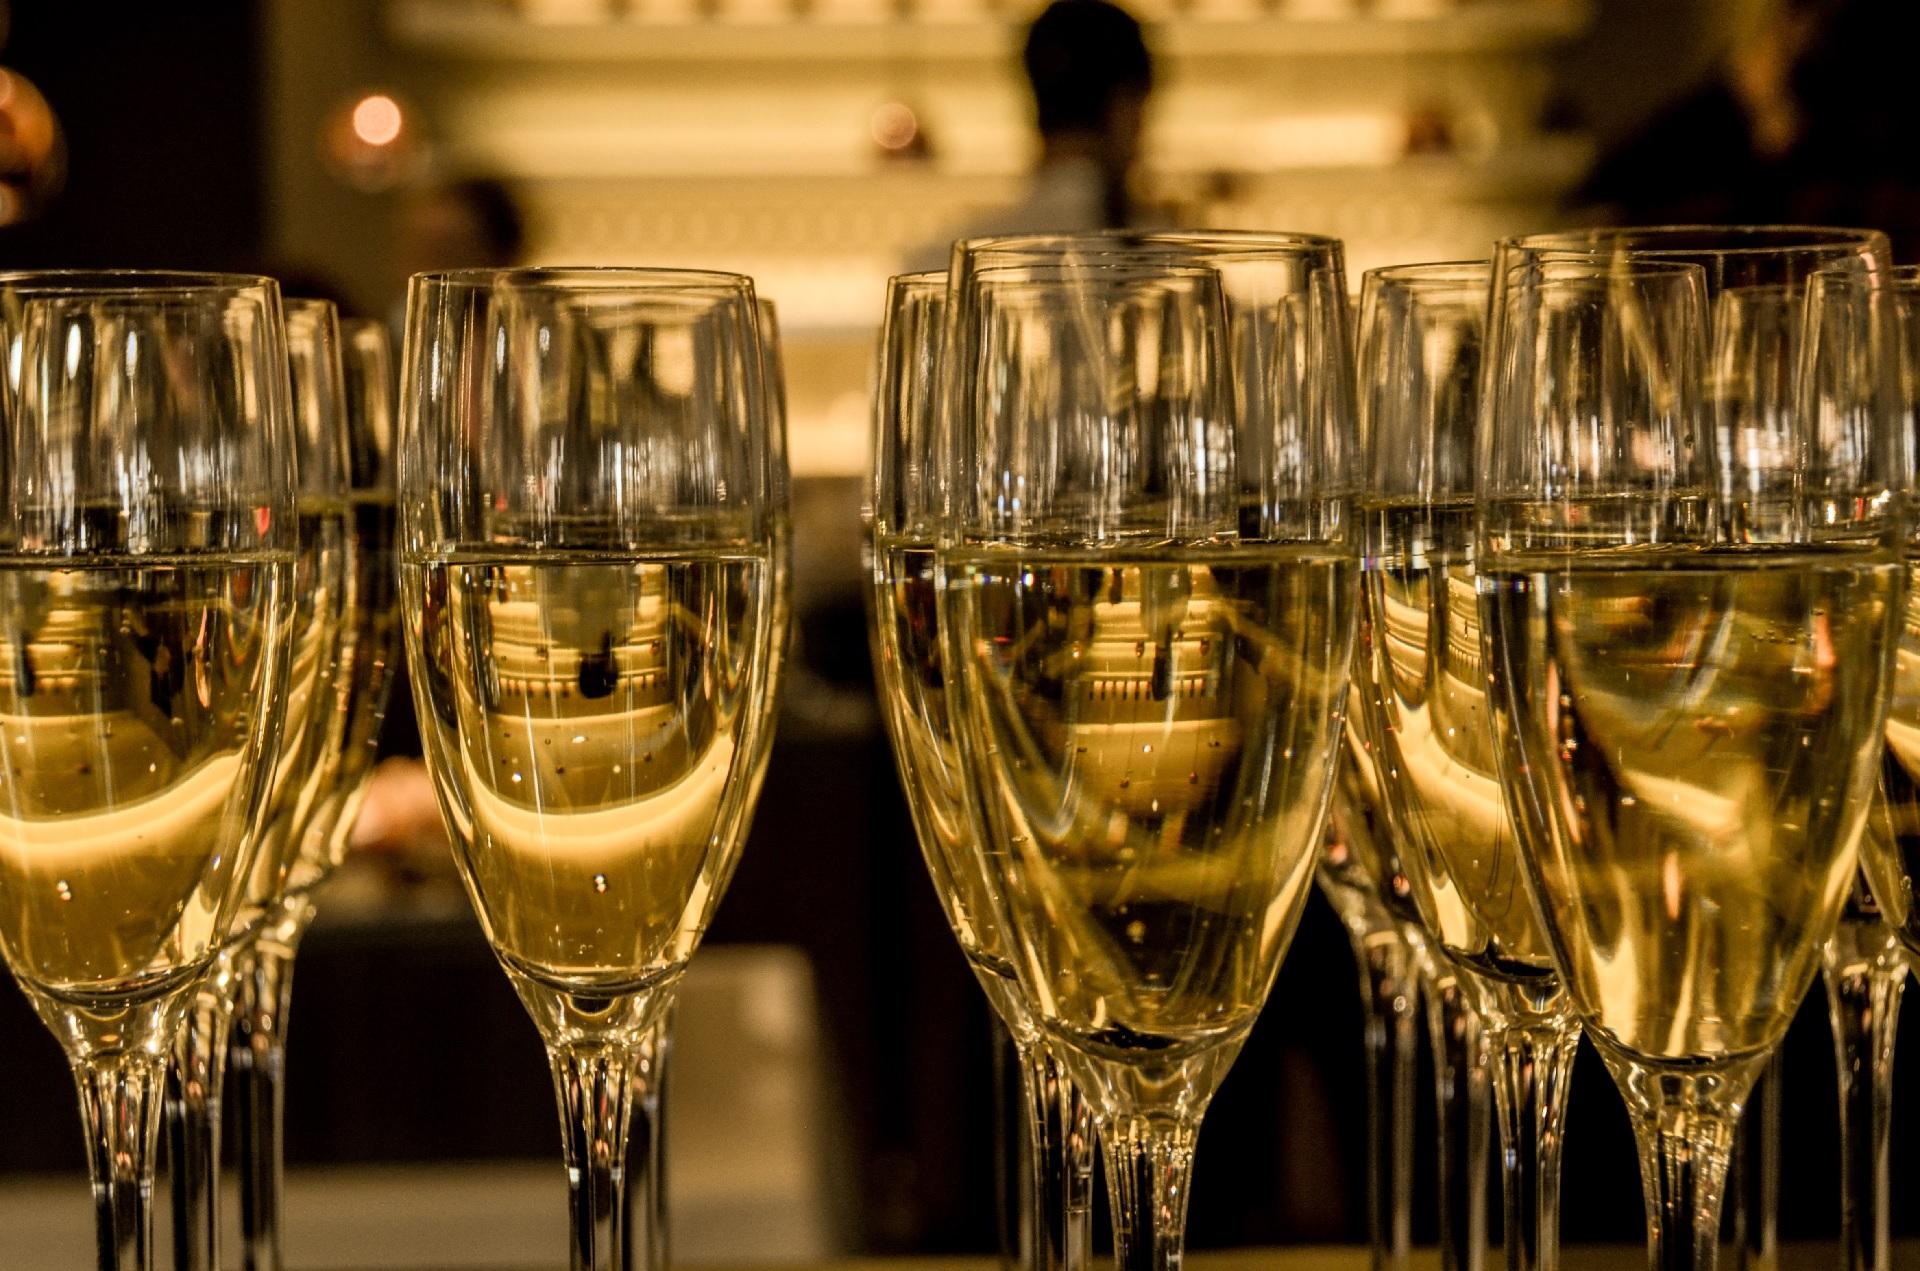 La historia del Champagne, de la serendipia al vino más famoso del mundo